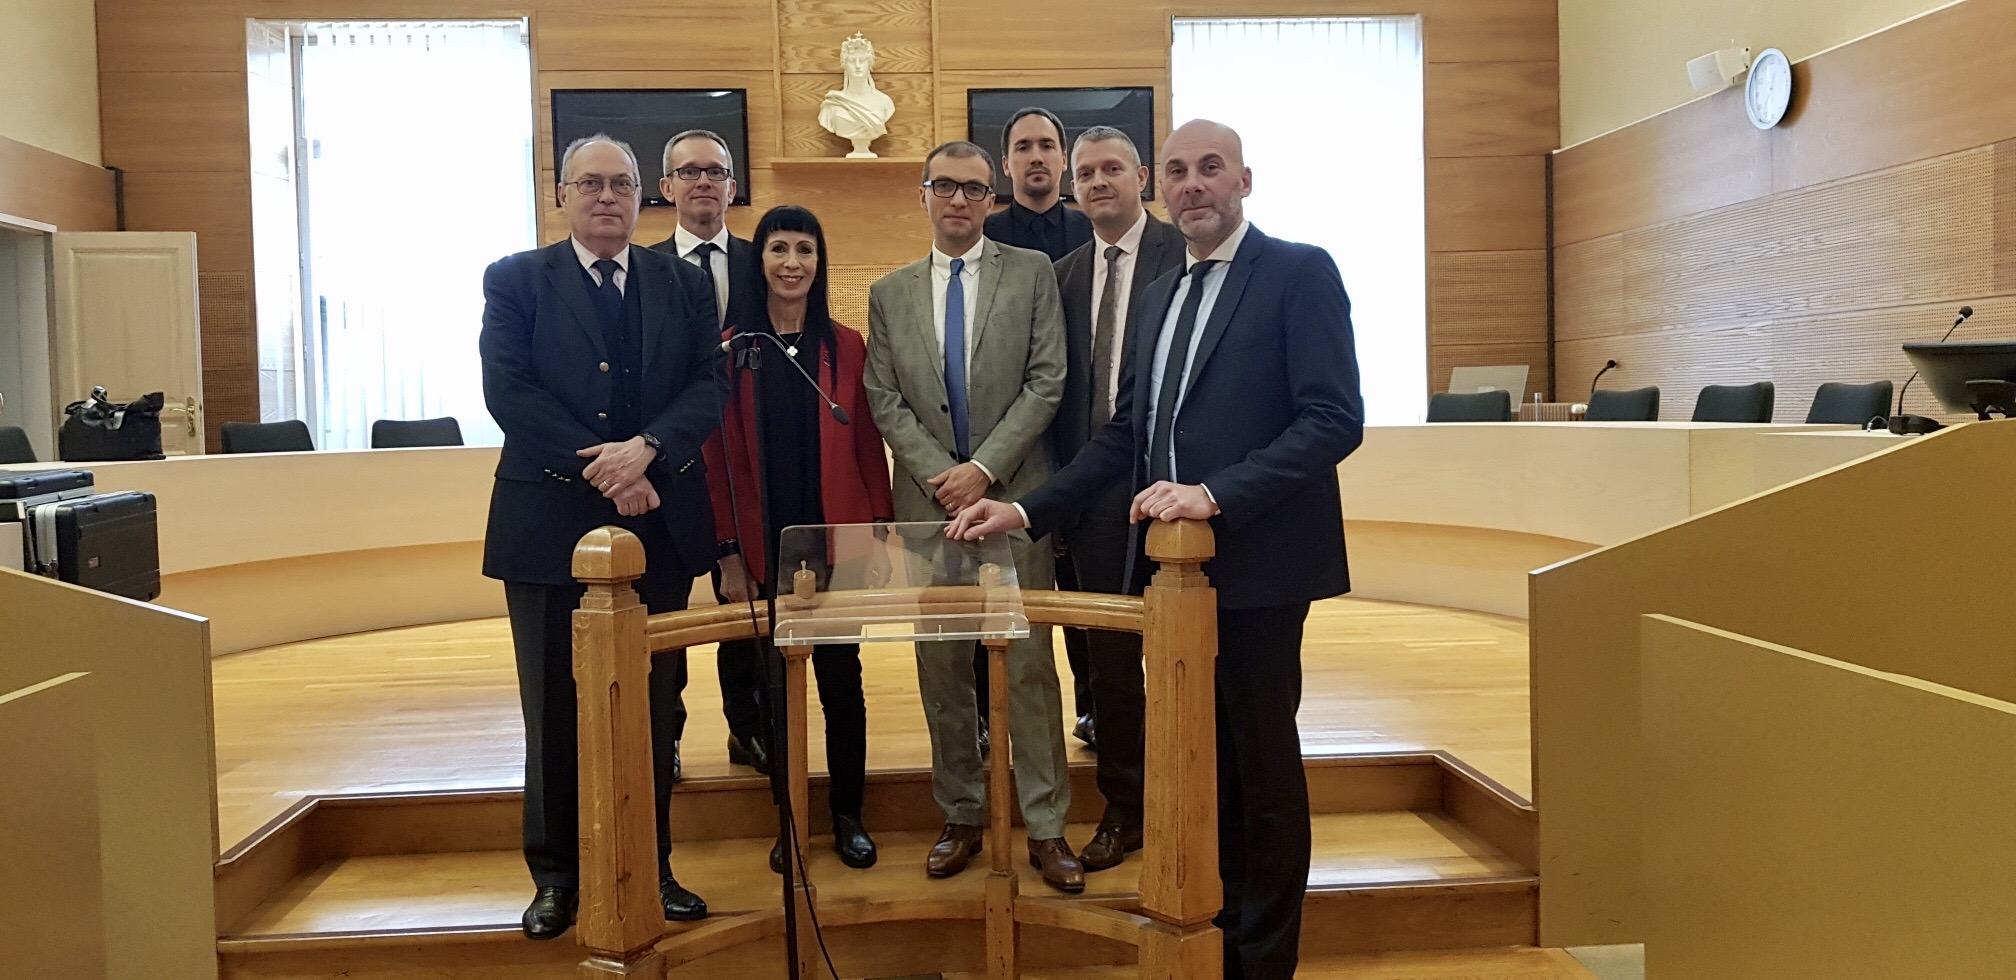 Tribunal de grande instance de Guéret, M. Bergougnous, M. Mayet, Mme Fricero, M. Baron, M. Hurel, M. Sauvage, M. Giraud